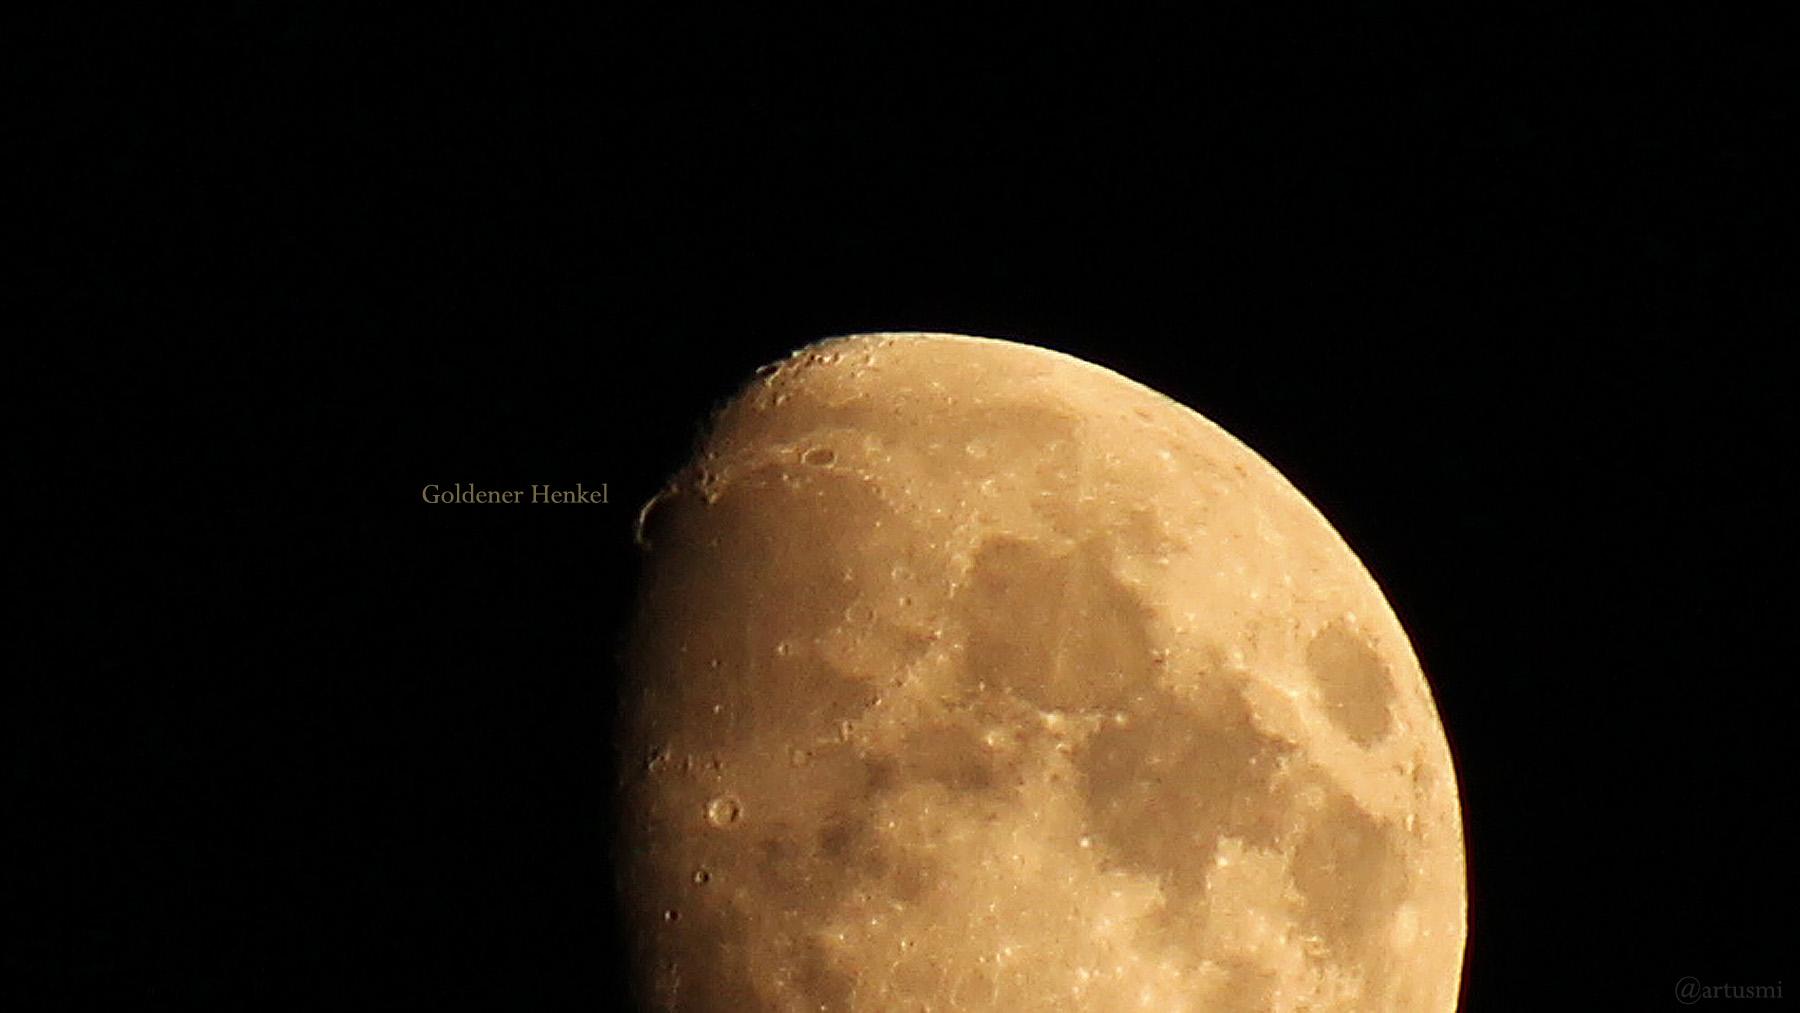 Goldener Henkel am 19. Juli 2021 am zunehmenden Mond